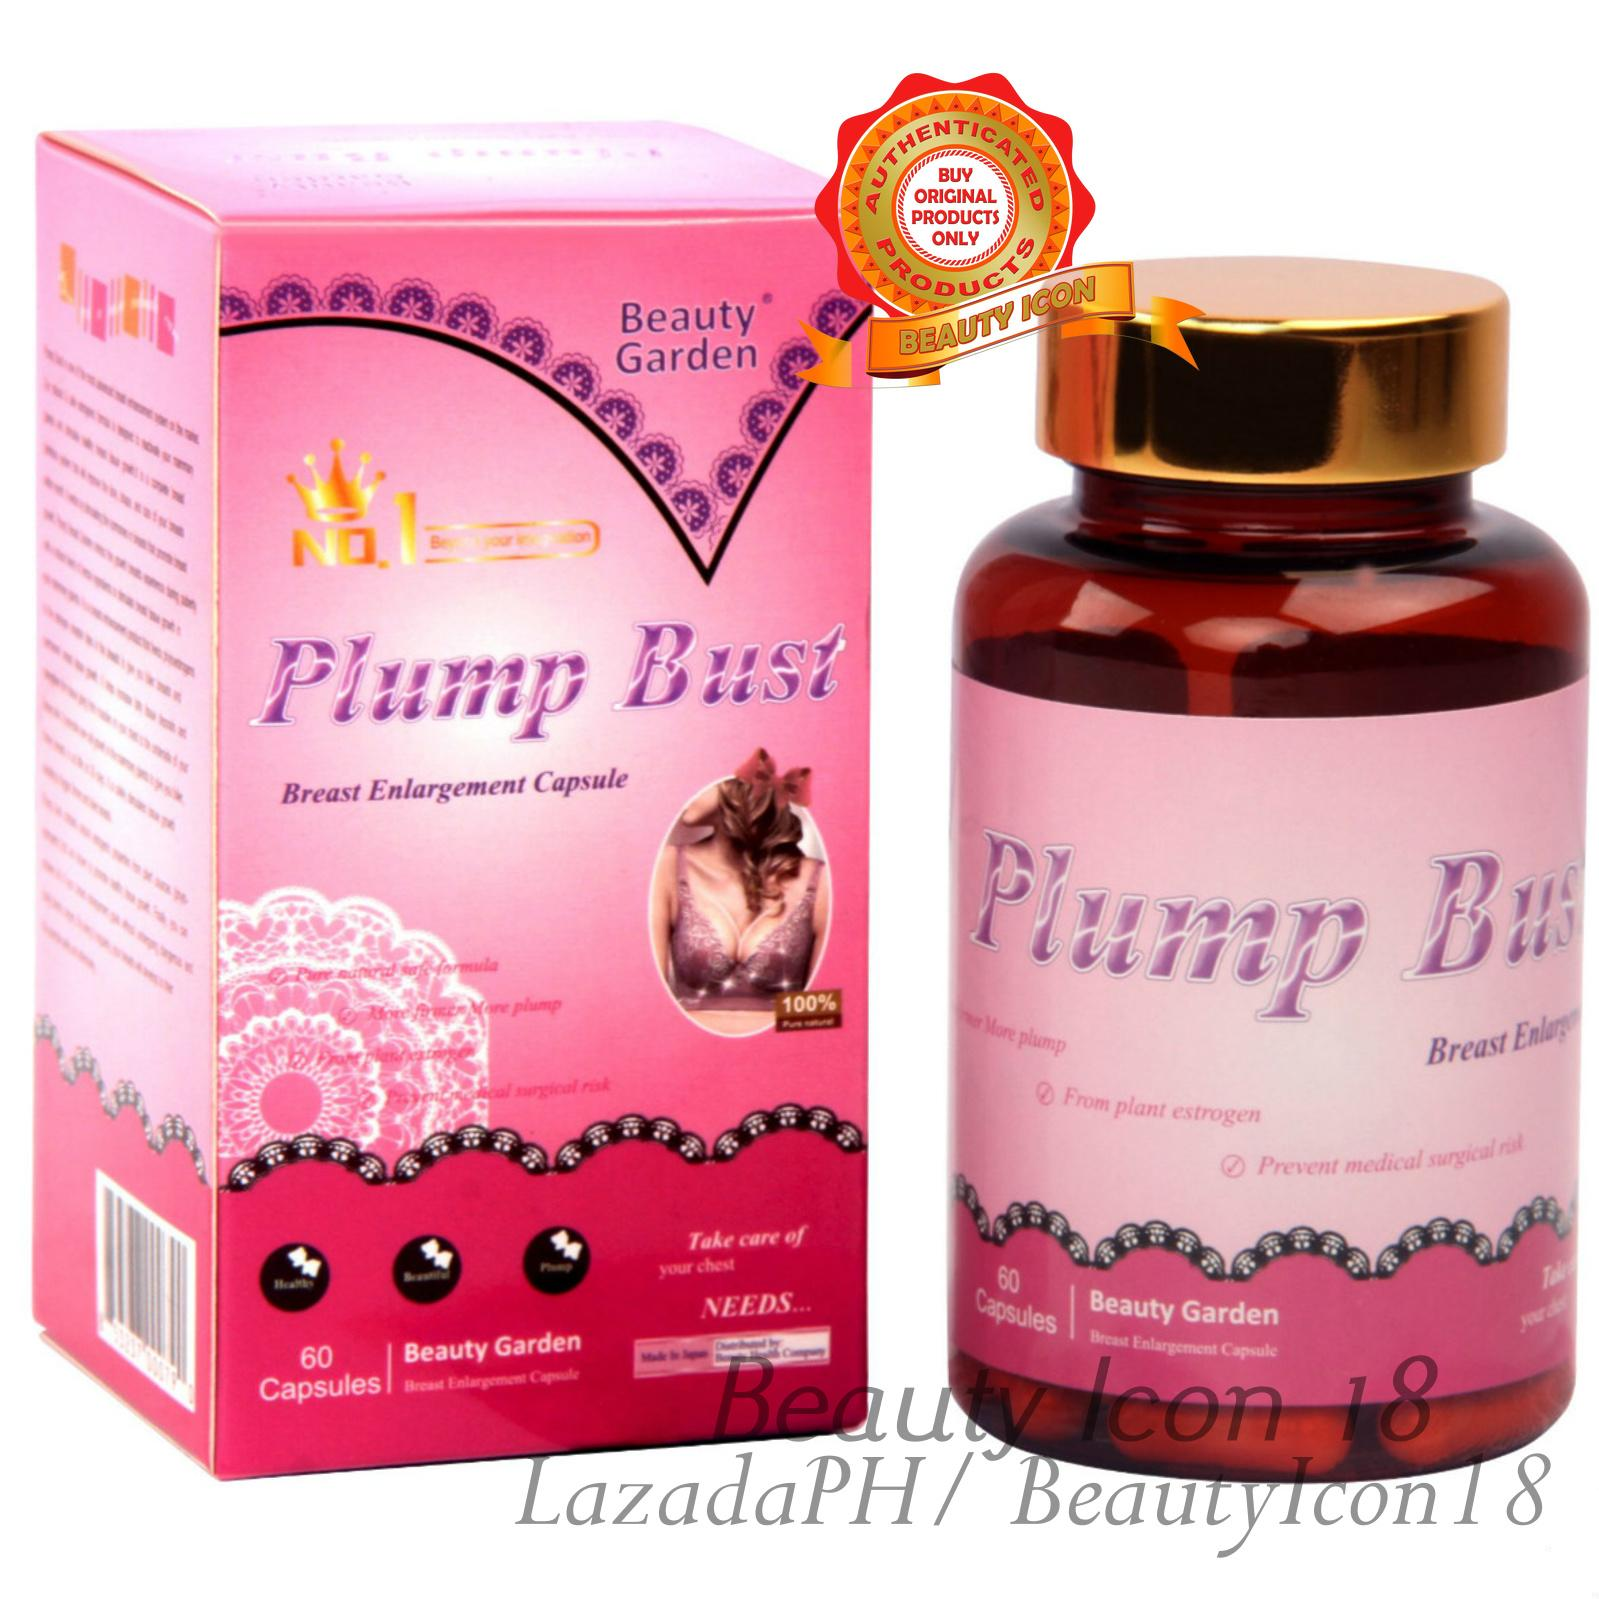 Product details of Beauty Garden Plump Bust Breast Enlargement Capsule